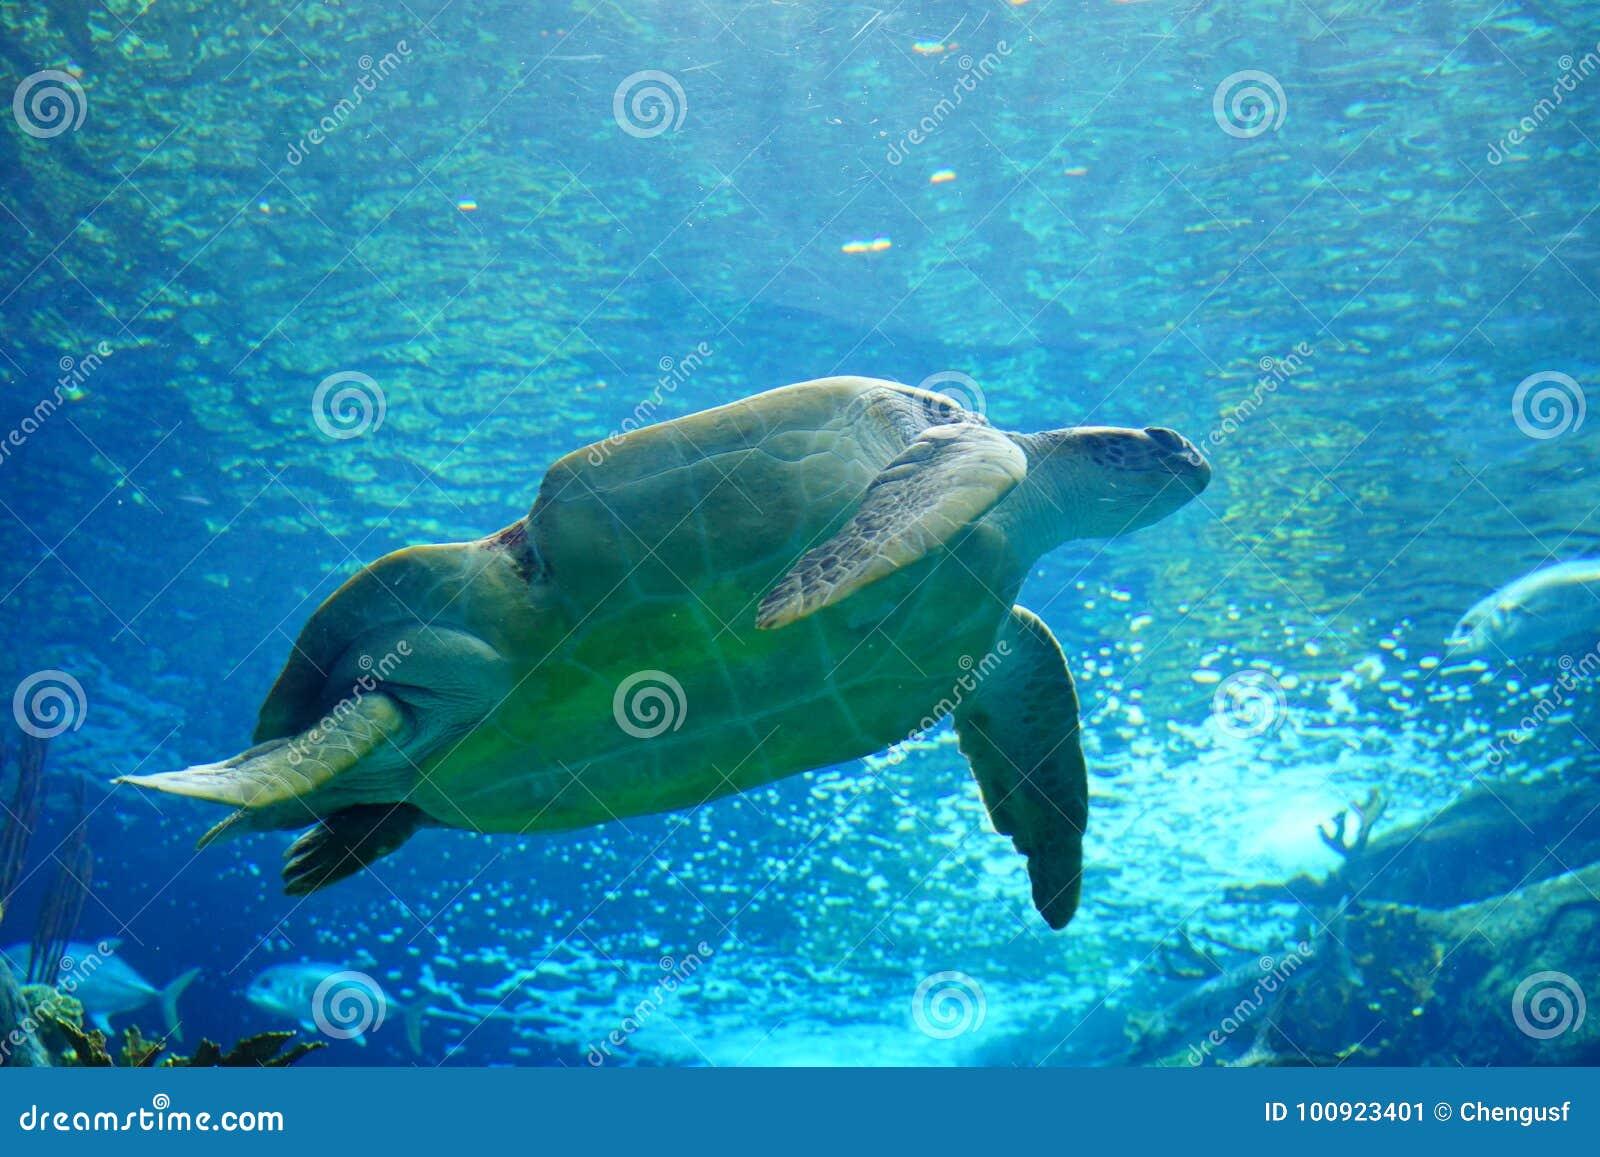 Uma tartaruga está nadando